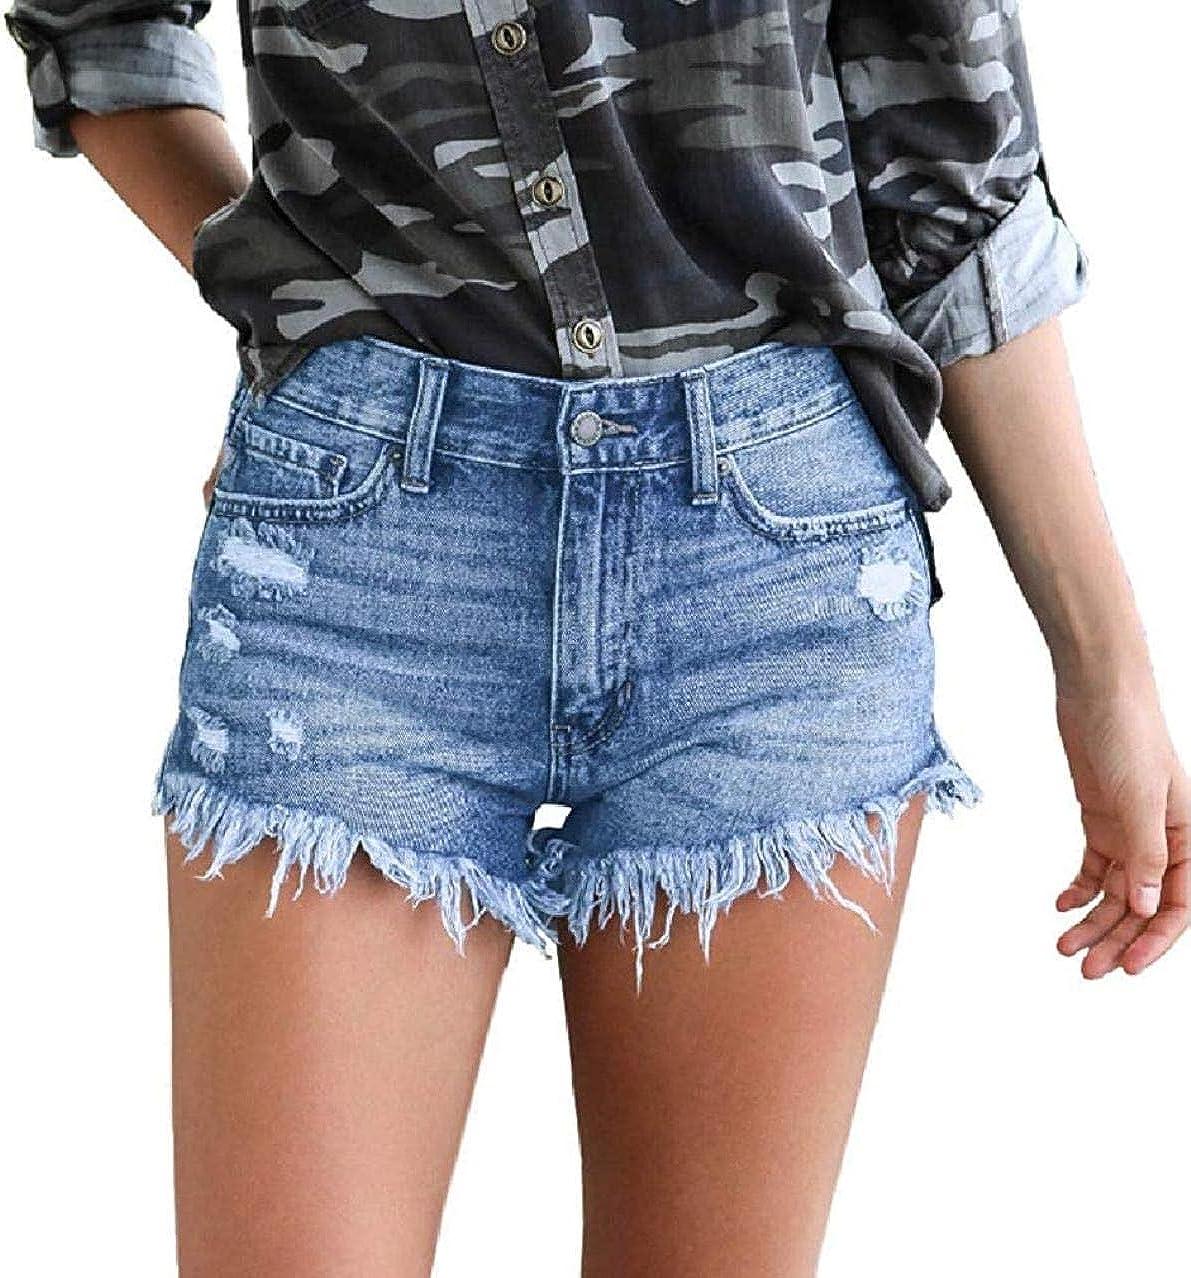 JNBGYAPS Women Summer Stretch High Rise Ripped Distressed Tassels Denim Shorts Jeans